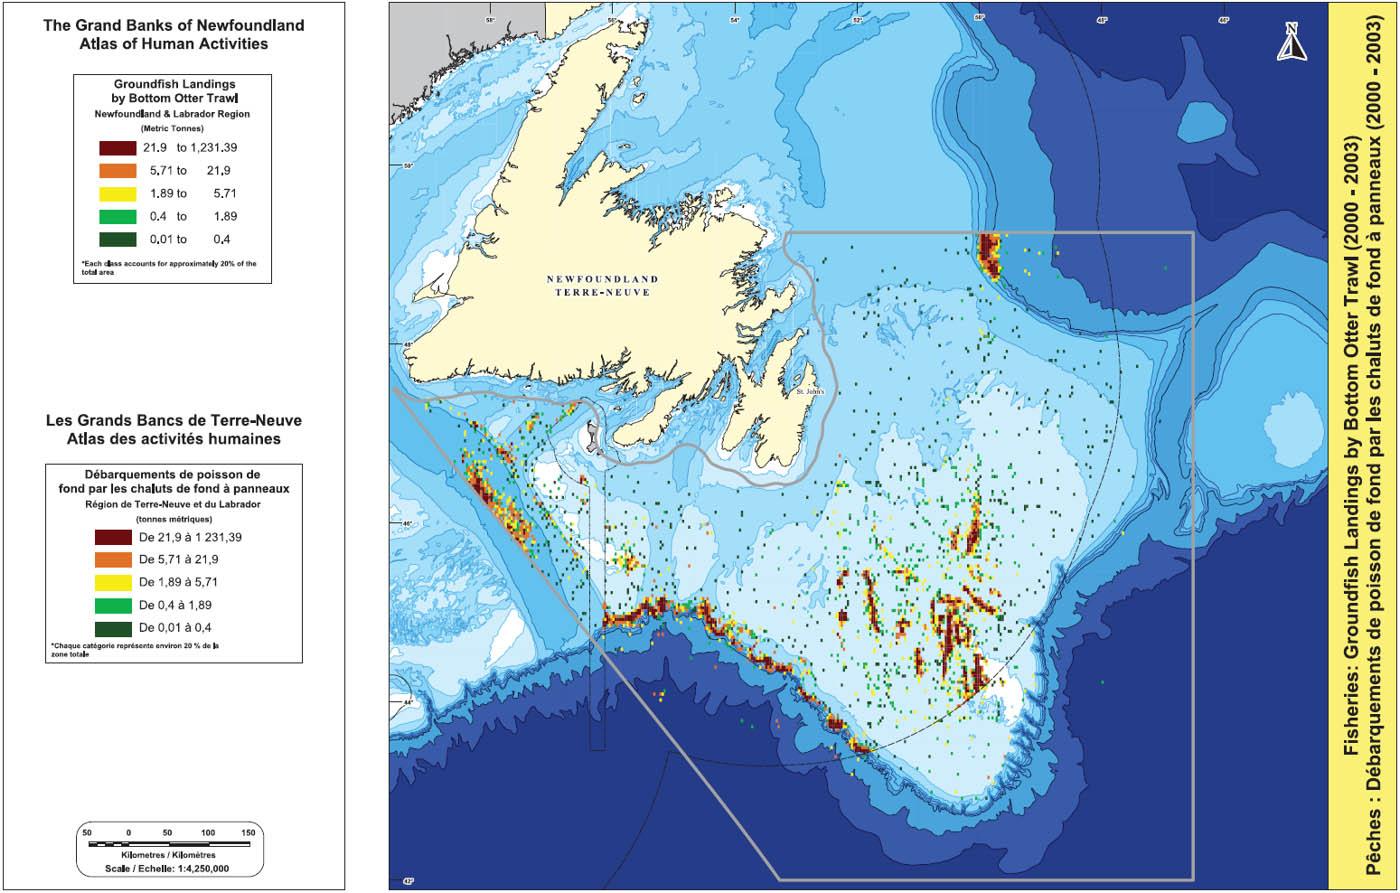 The Grand Banks of Newfoundland: Atlas of Human Activities